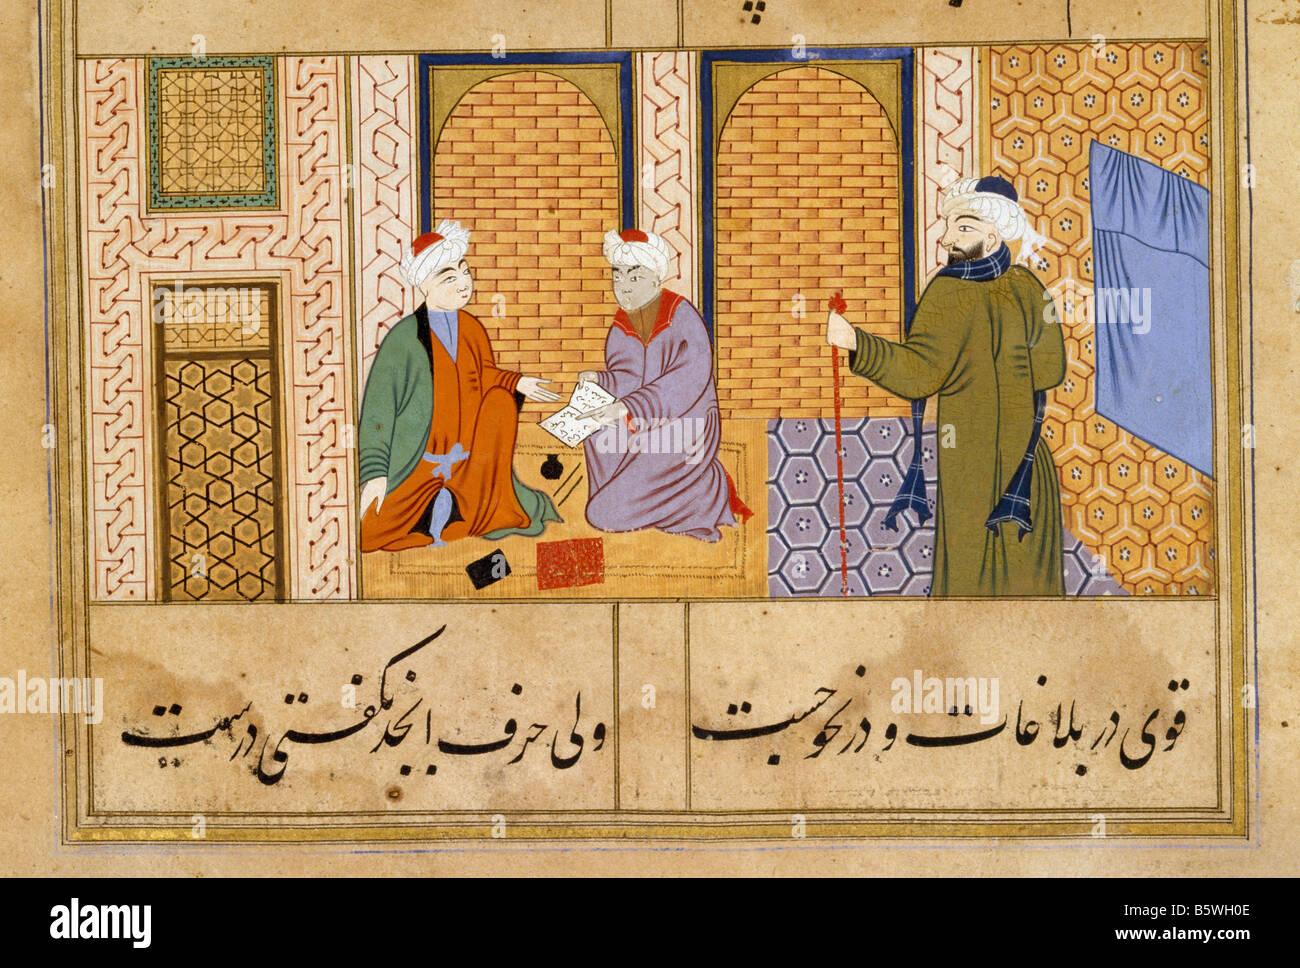 Fly-leaf of Bustan-i-Sadi Islamic book illustration inscribed: made for Nasir Shah Khilji of Mandu presented to - Stock Image